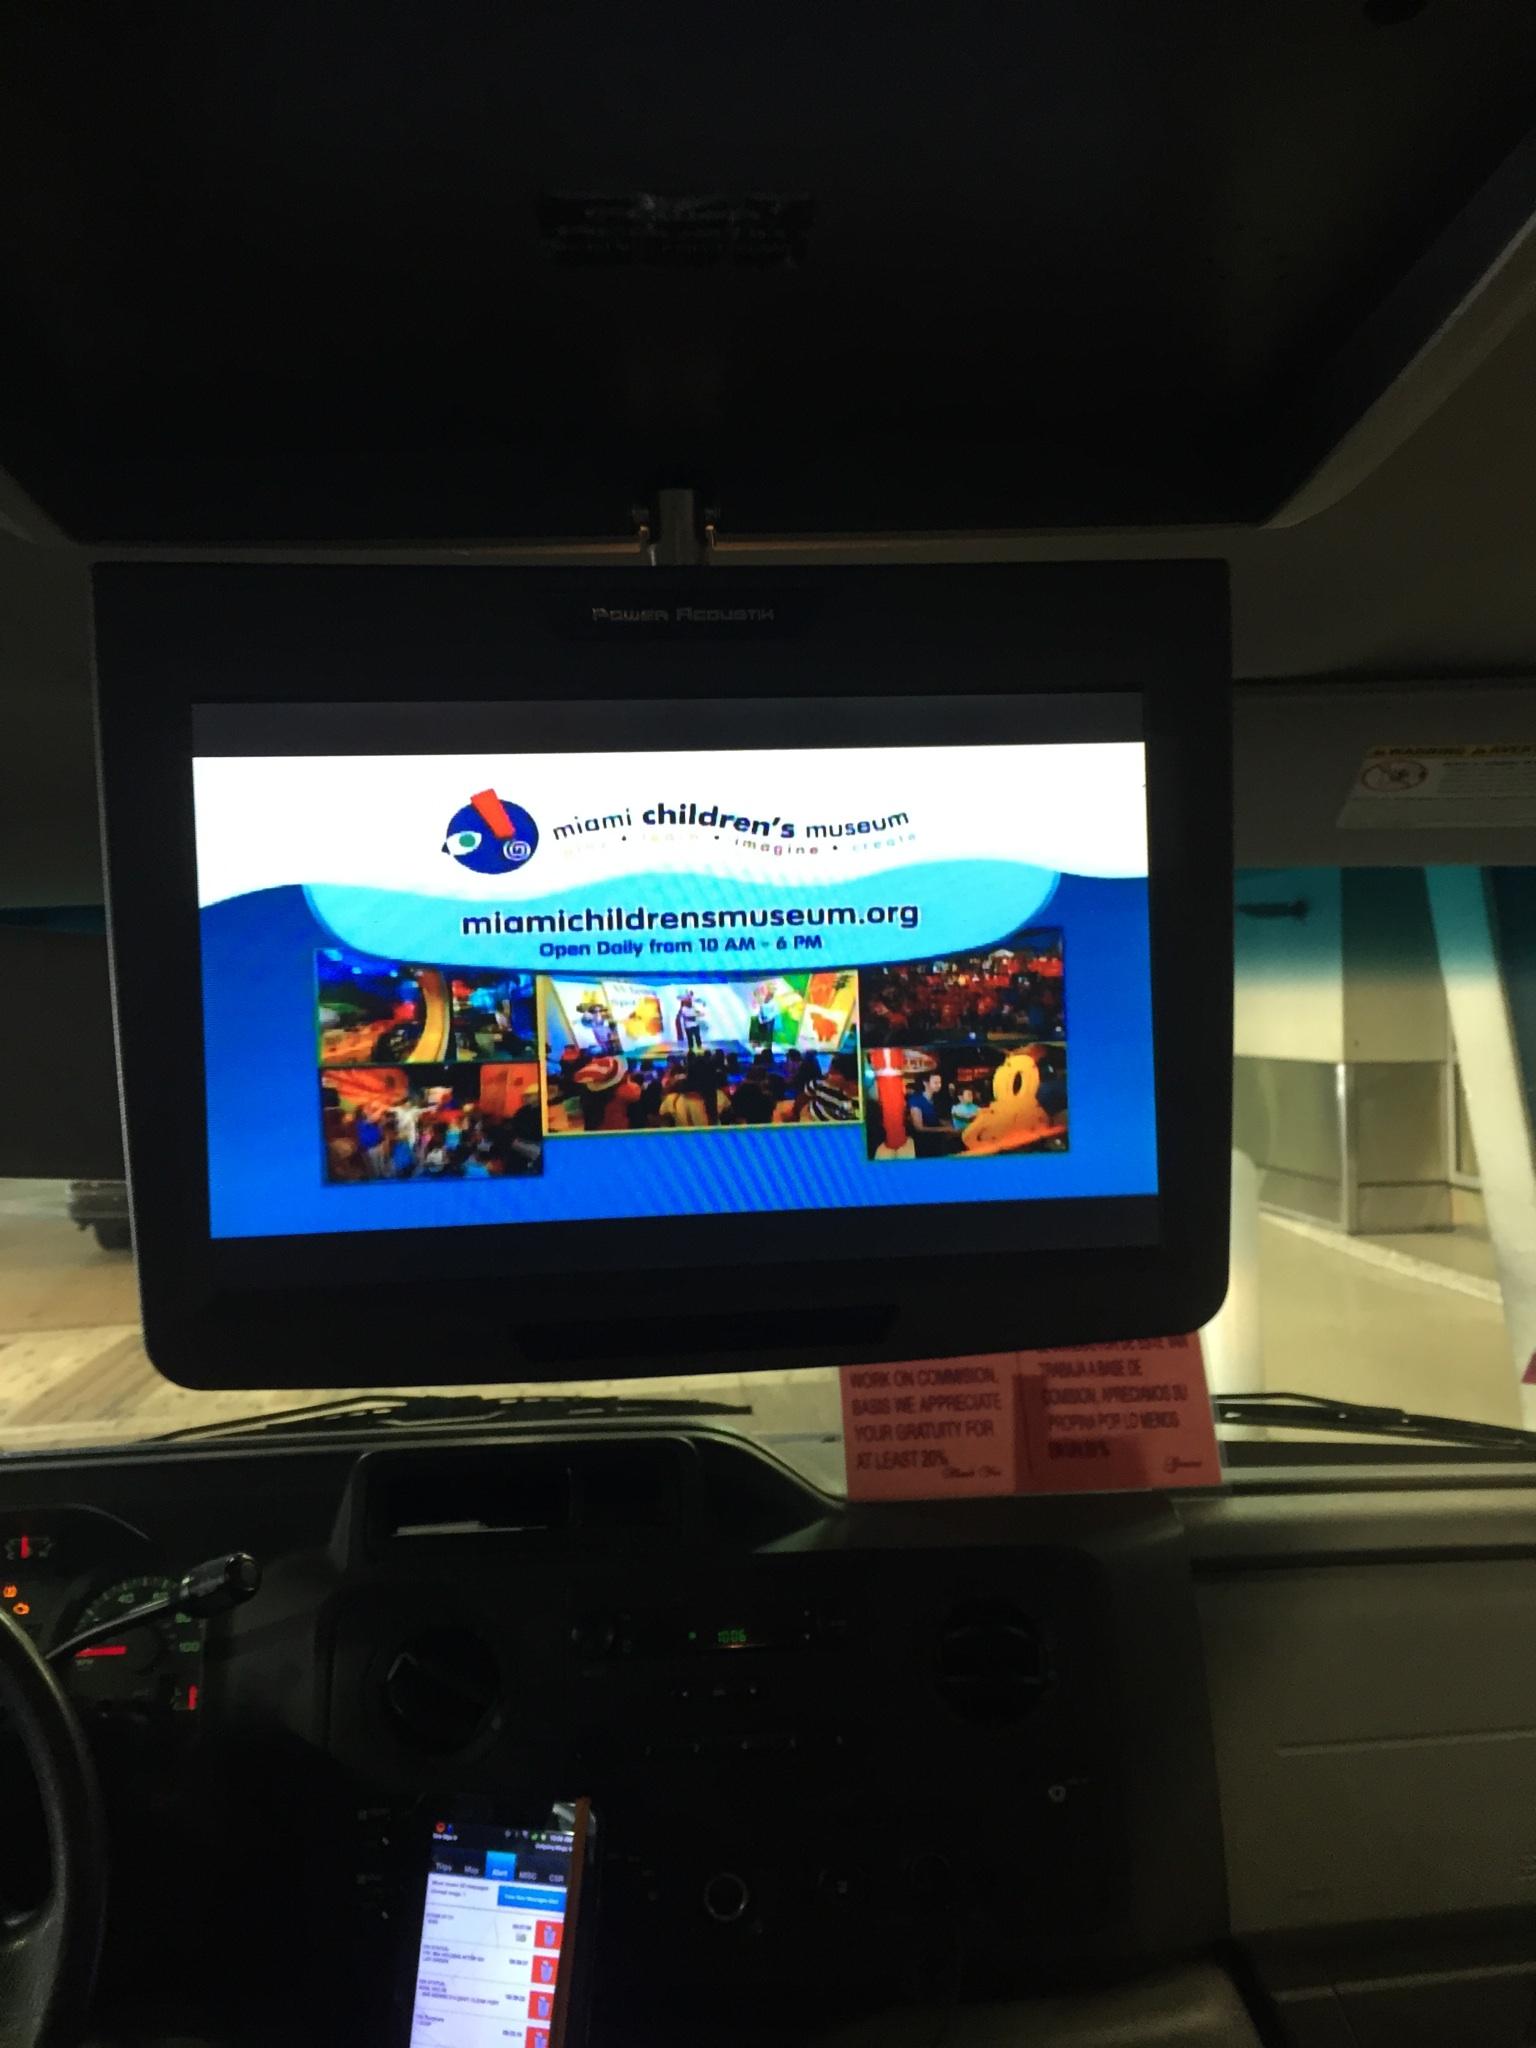 Airport Shuttle CCTV advertisement